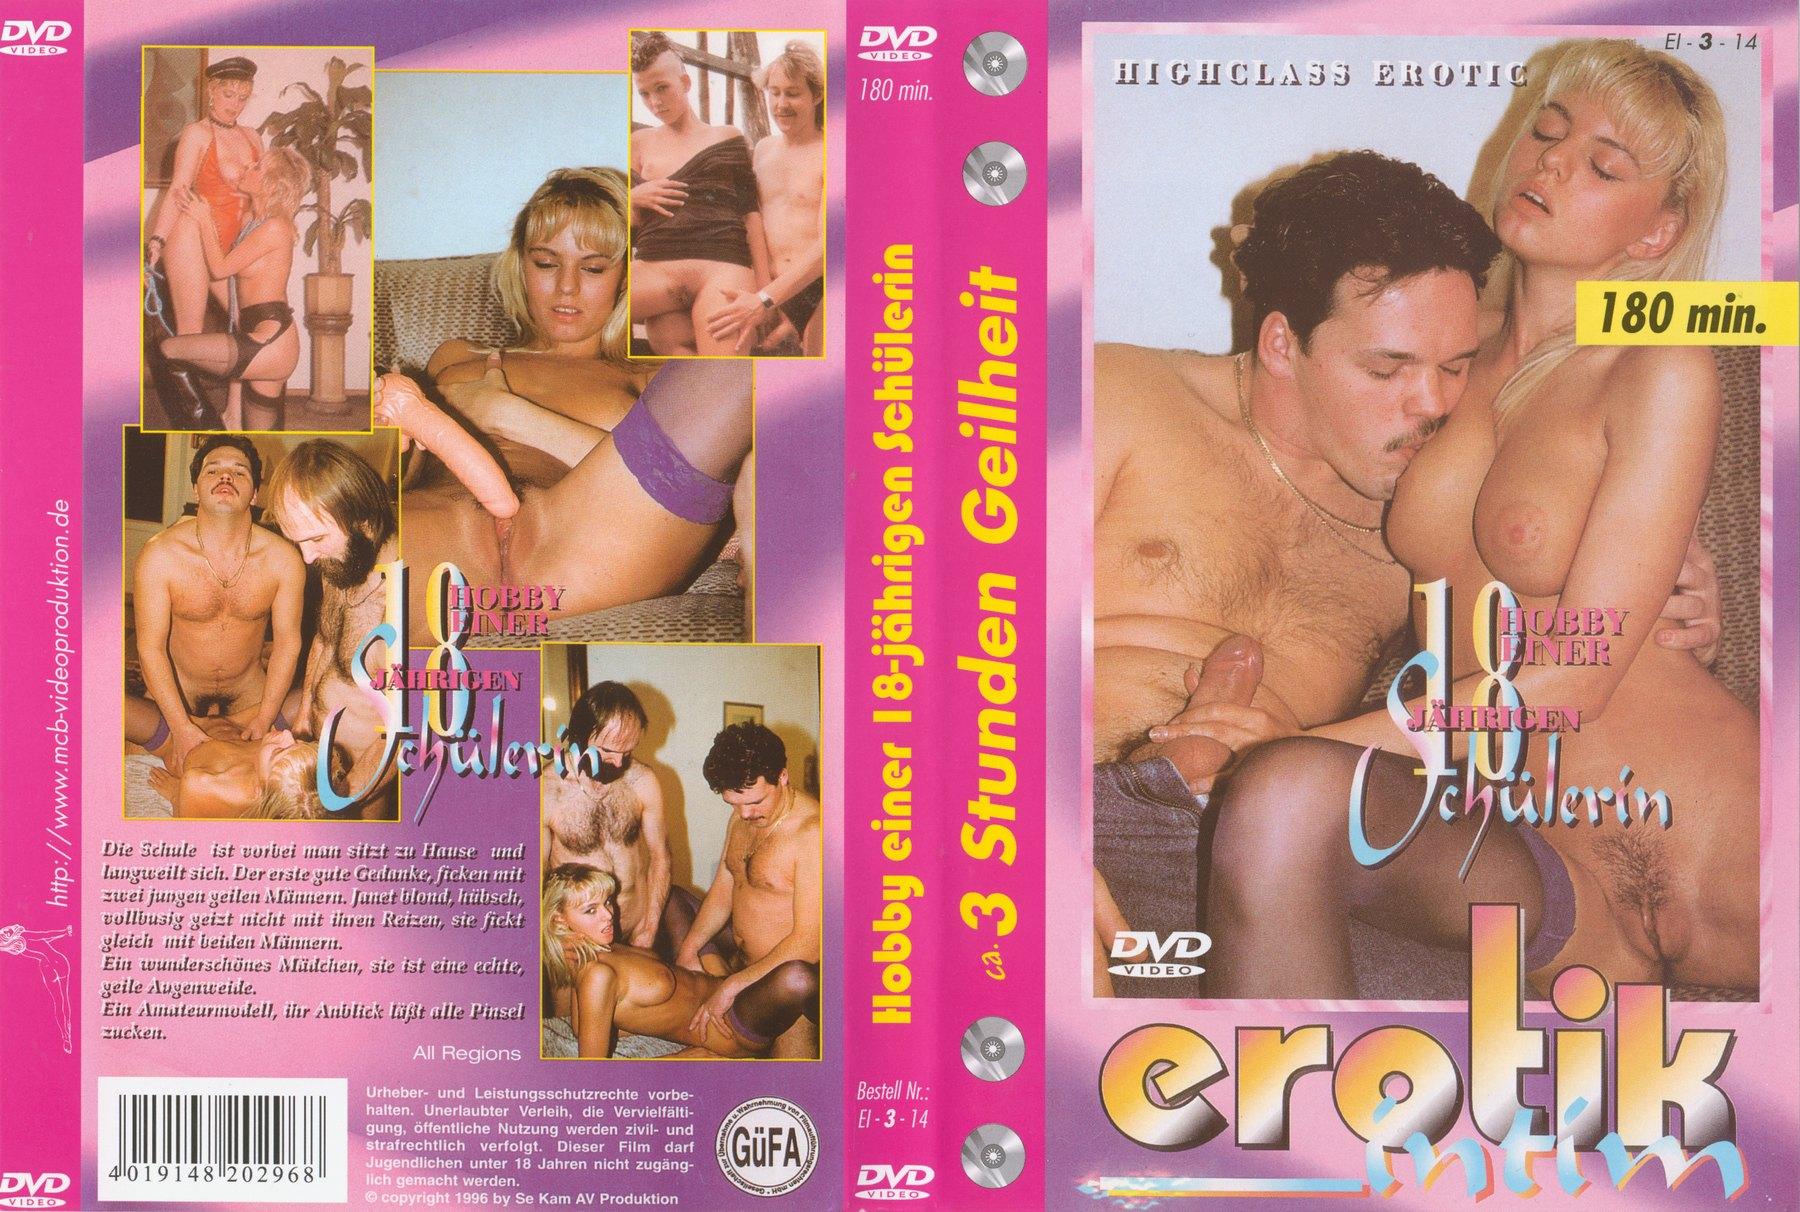 Erotik Intim – 18 Jähriges Irokesengirl Auf Waldfick(1995)